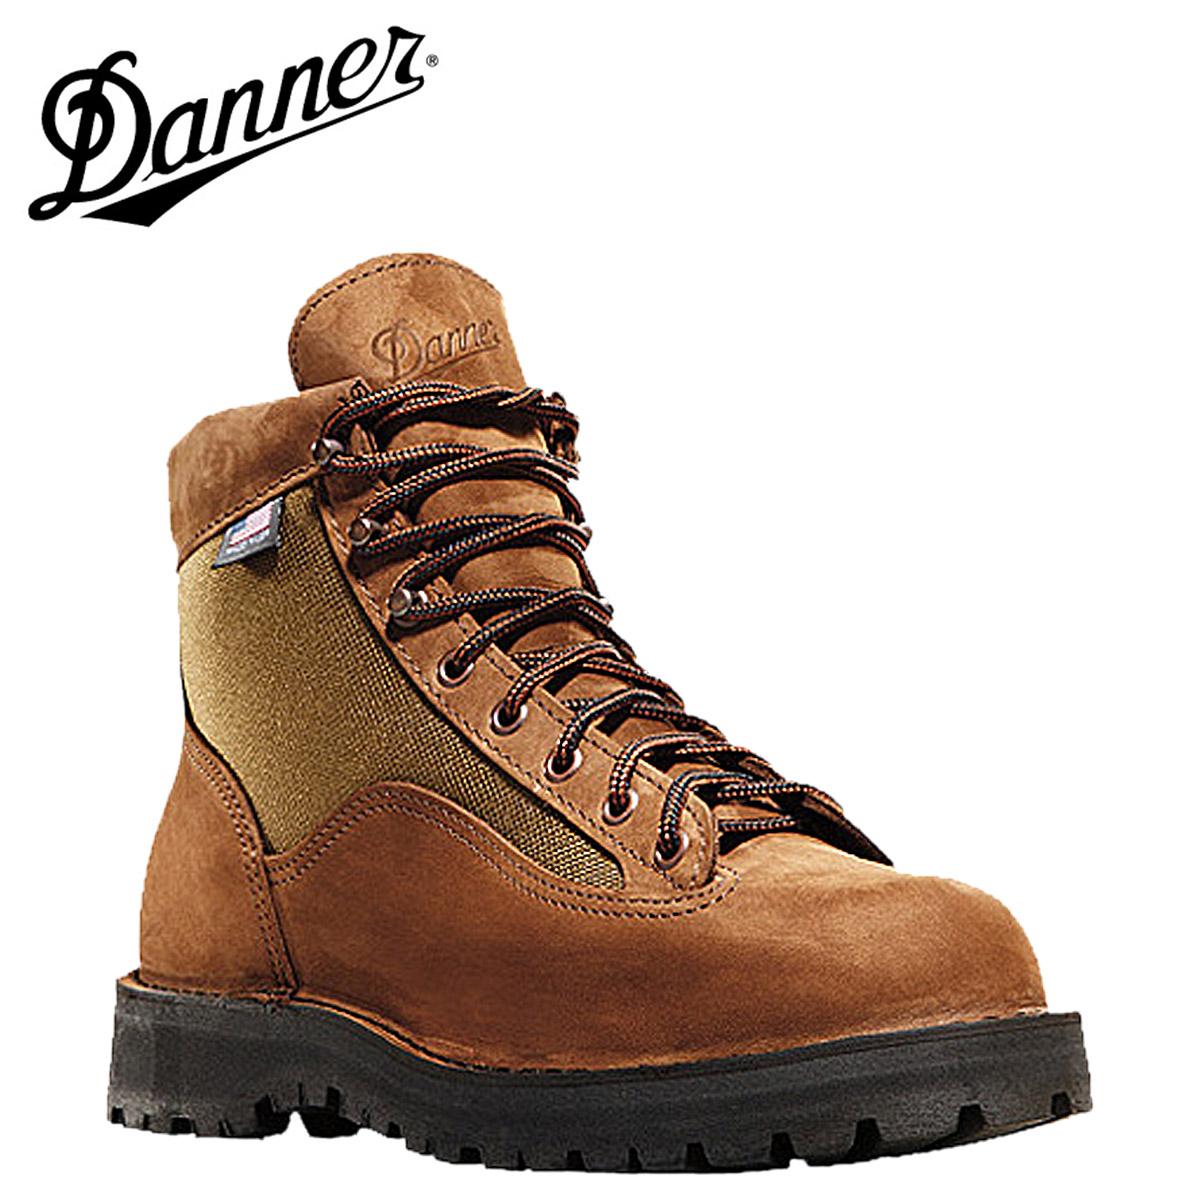 Danner ダナー ダナーライト2 33000 ライトブラウン Danner Light II Dワイズ EEワイズ ヌバック ブーツ BOOTS Made in USA メンズ [3/3 再入荷]